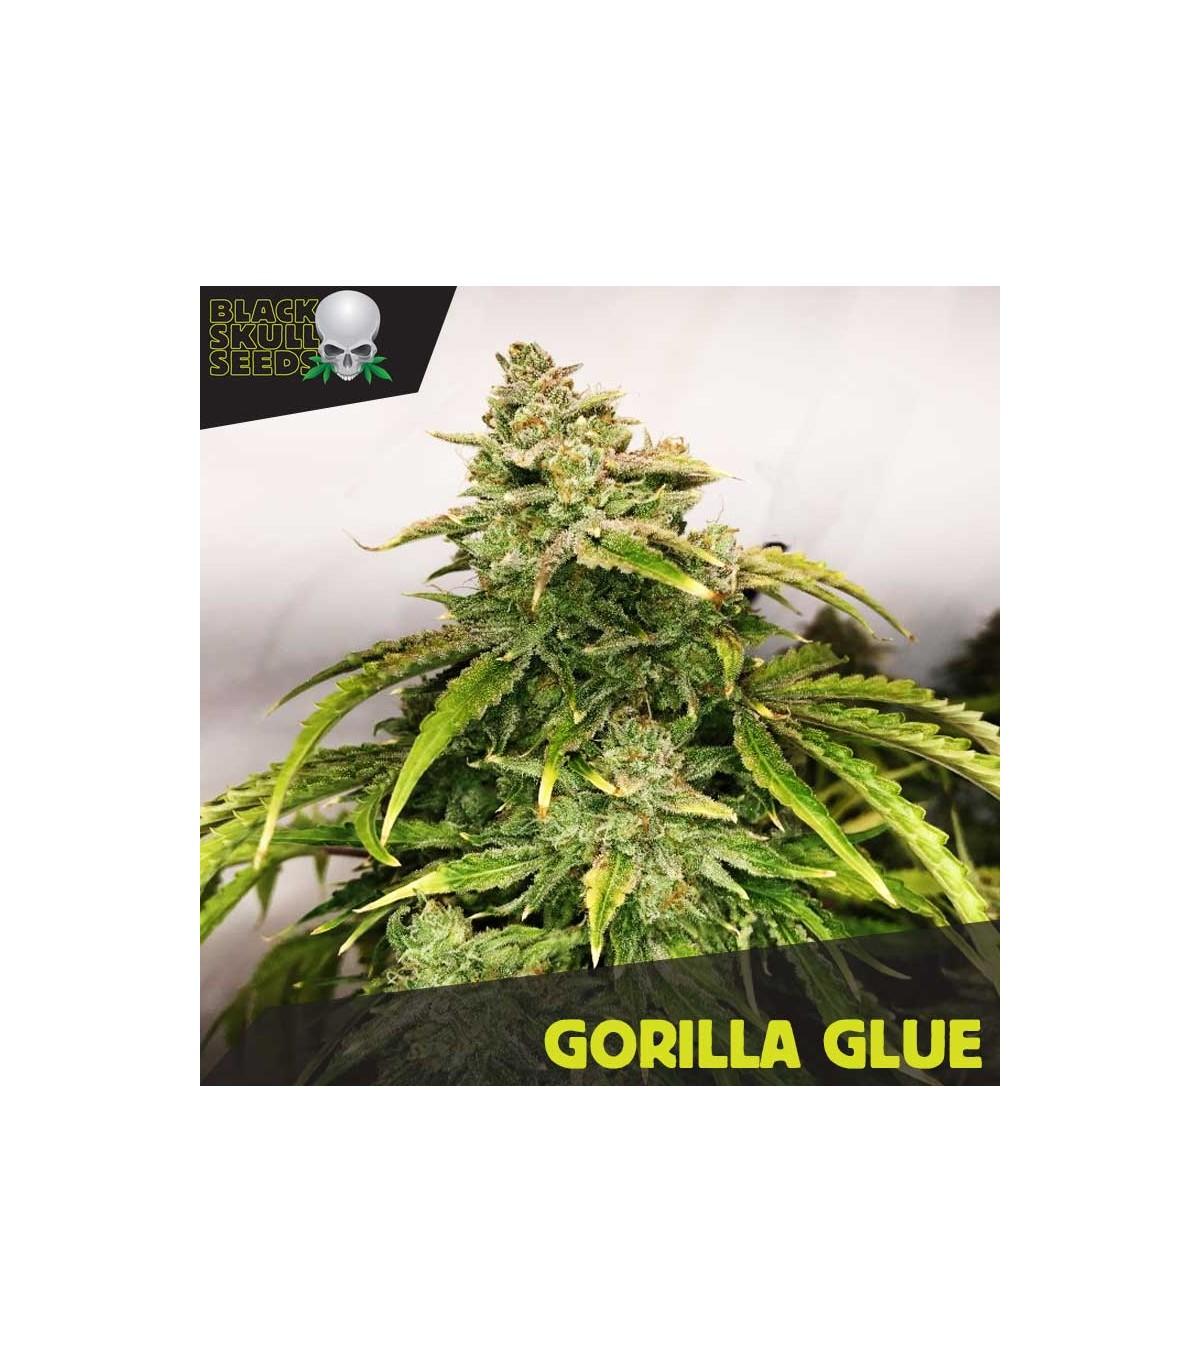 Gorilla Glue - 3 feminized